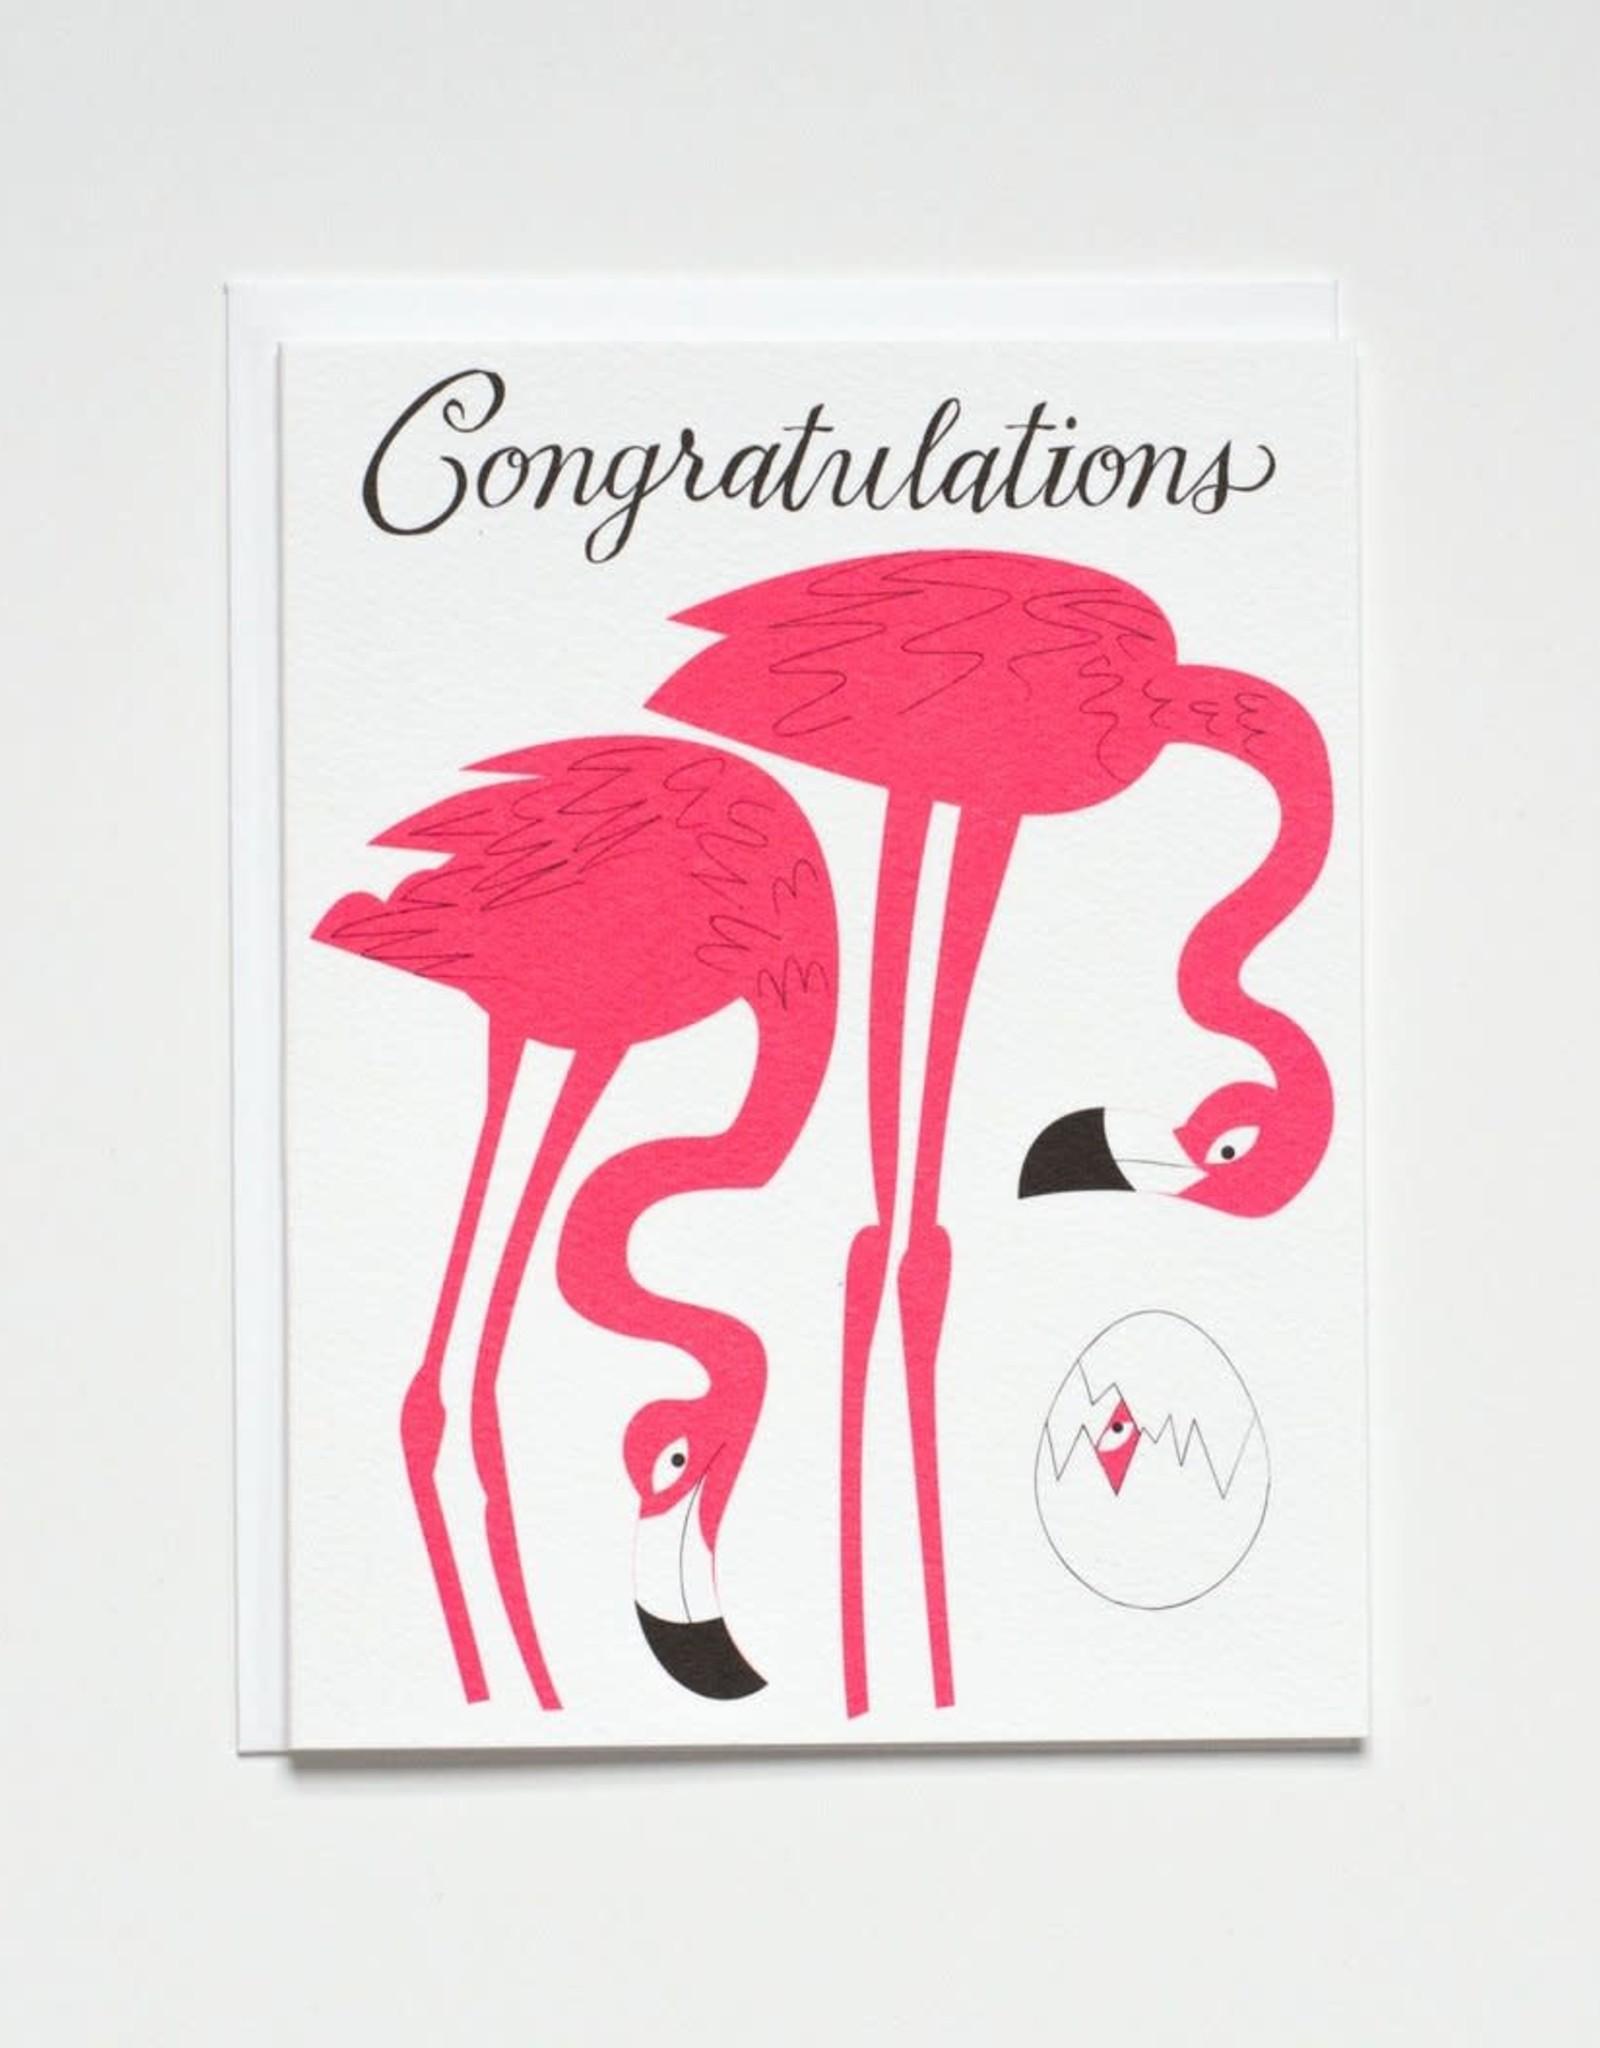 Banquet Atelier & Workshop Flamingo Congratulations - Note Card